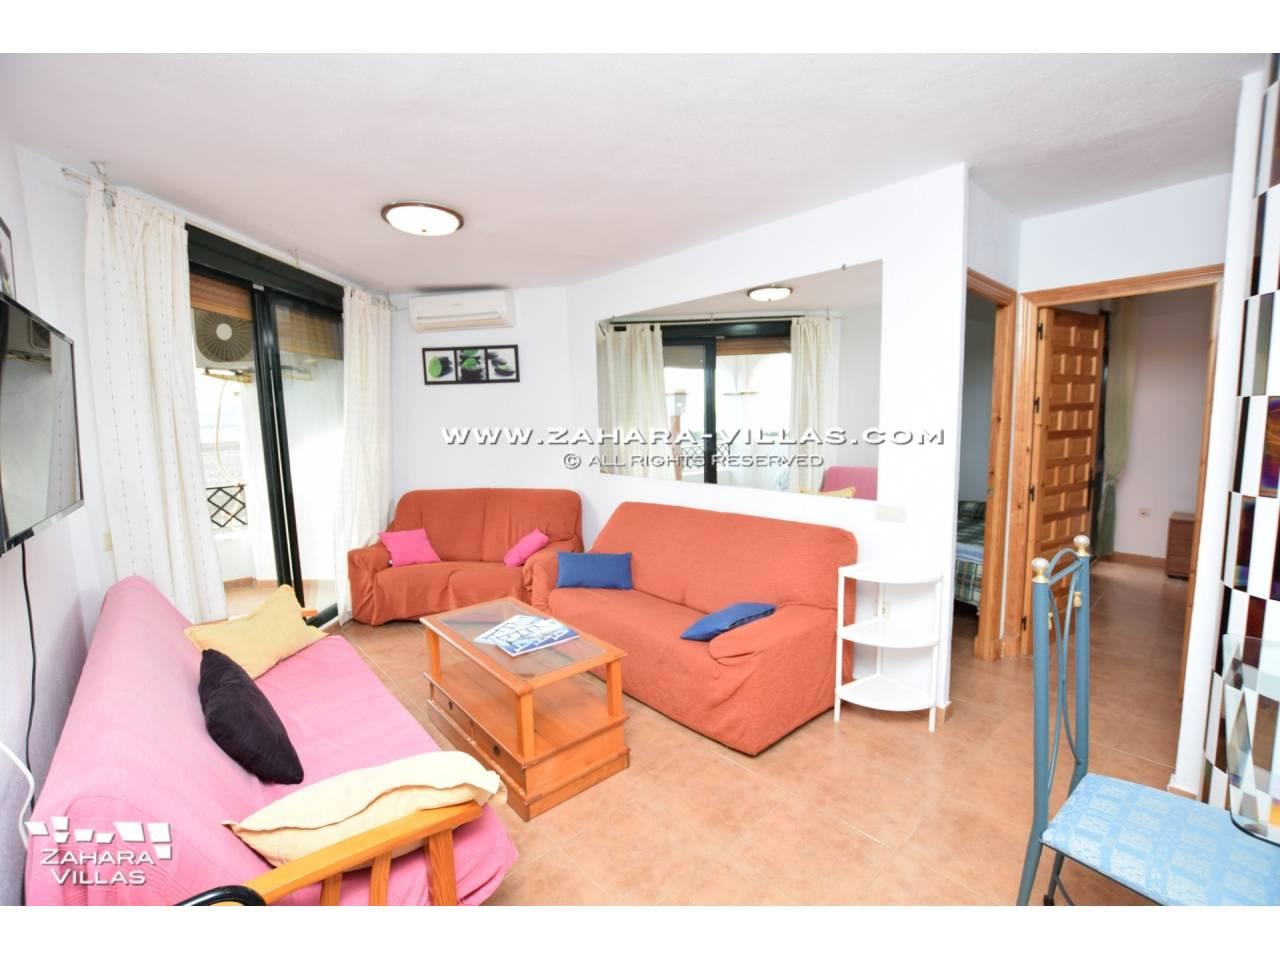 Imagen 12 de Penthouse for sale in Zahara de los Atunes